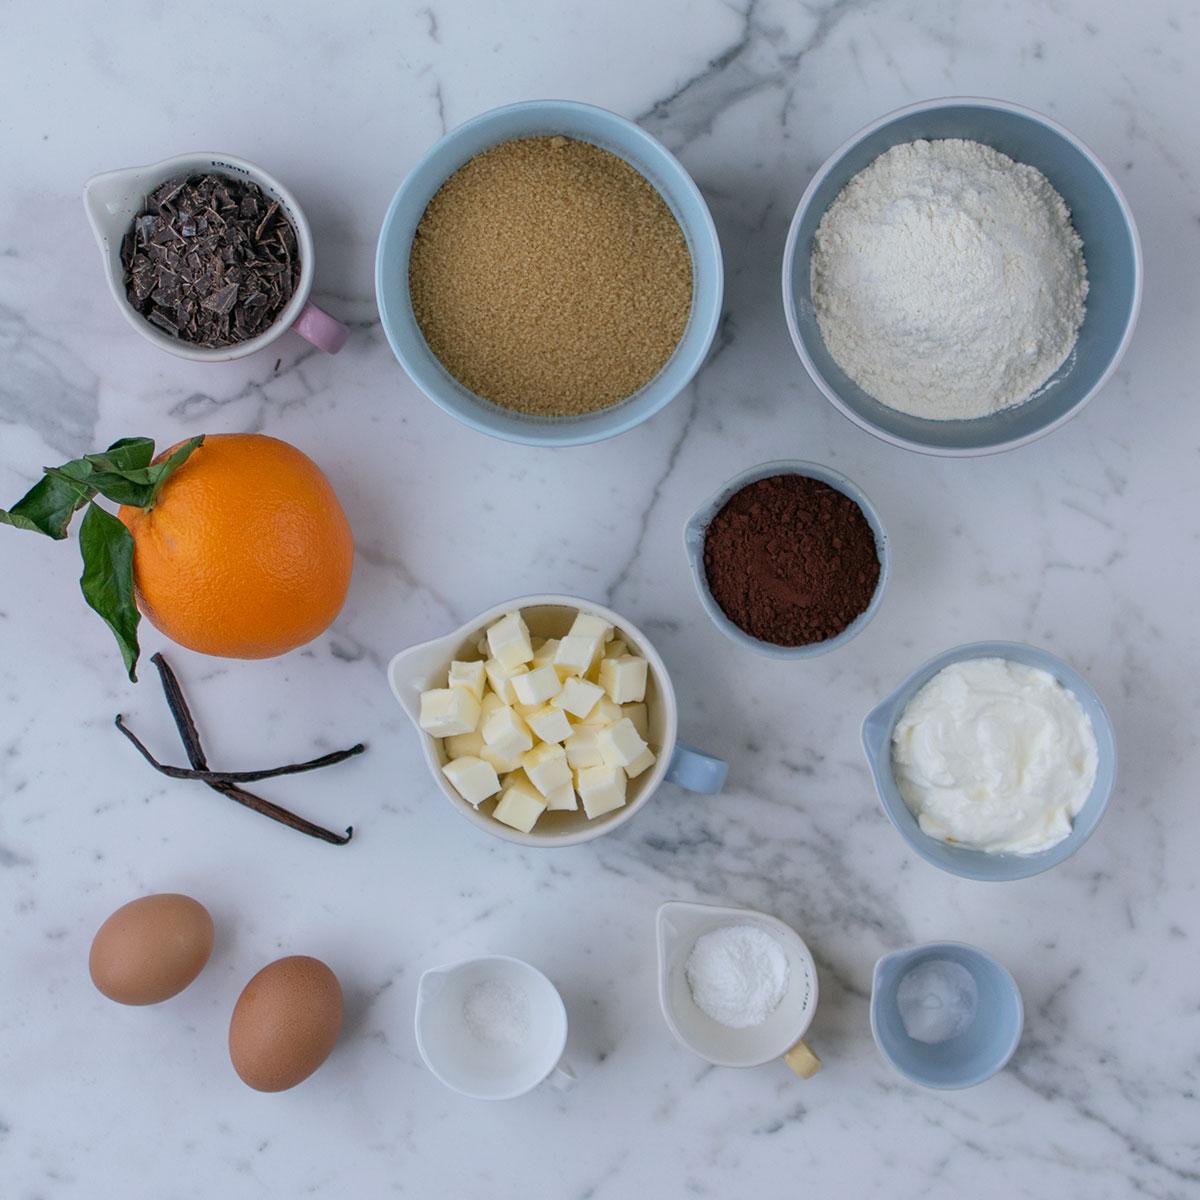 plumcake_cioccolato_arancia_ingredienti